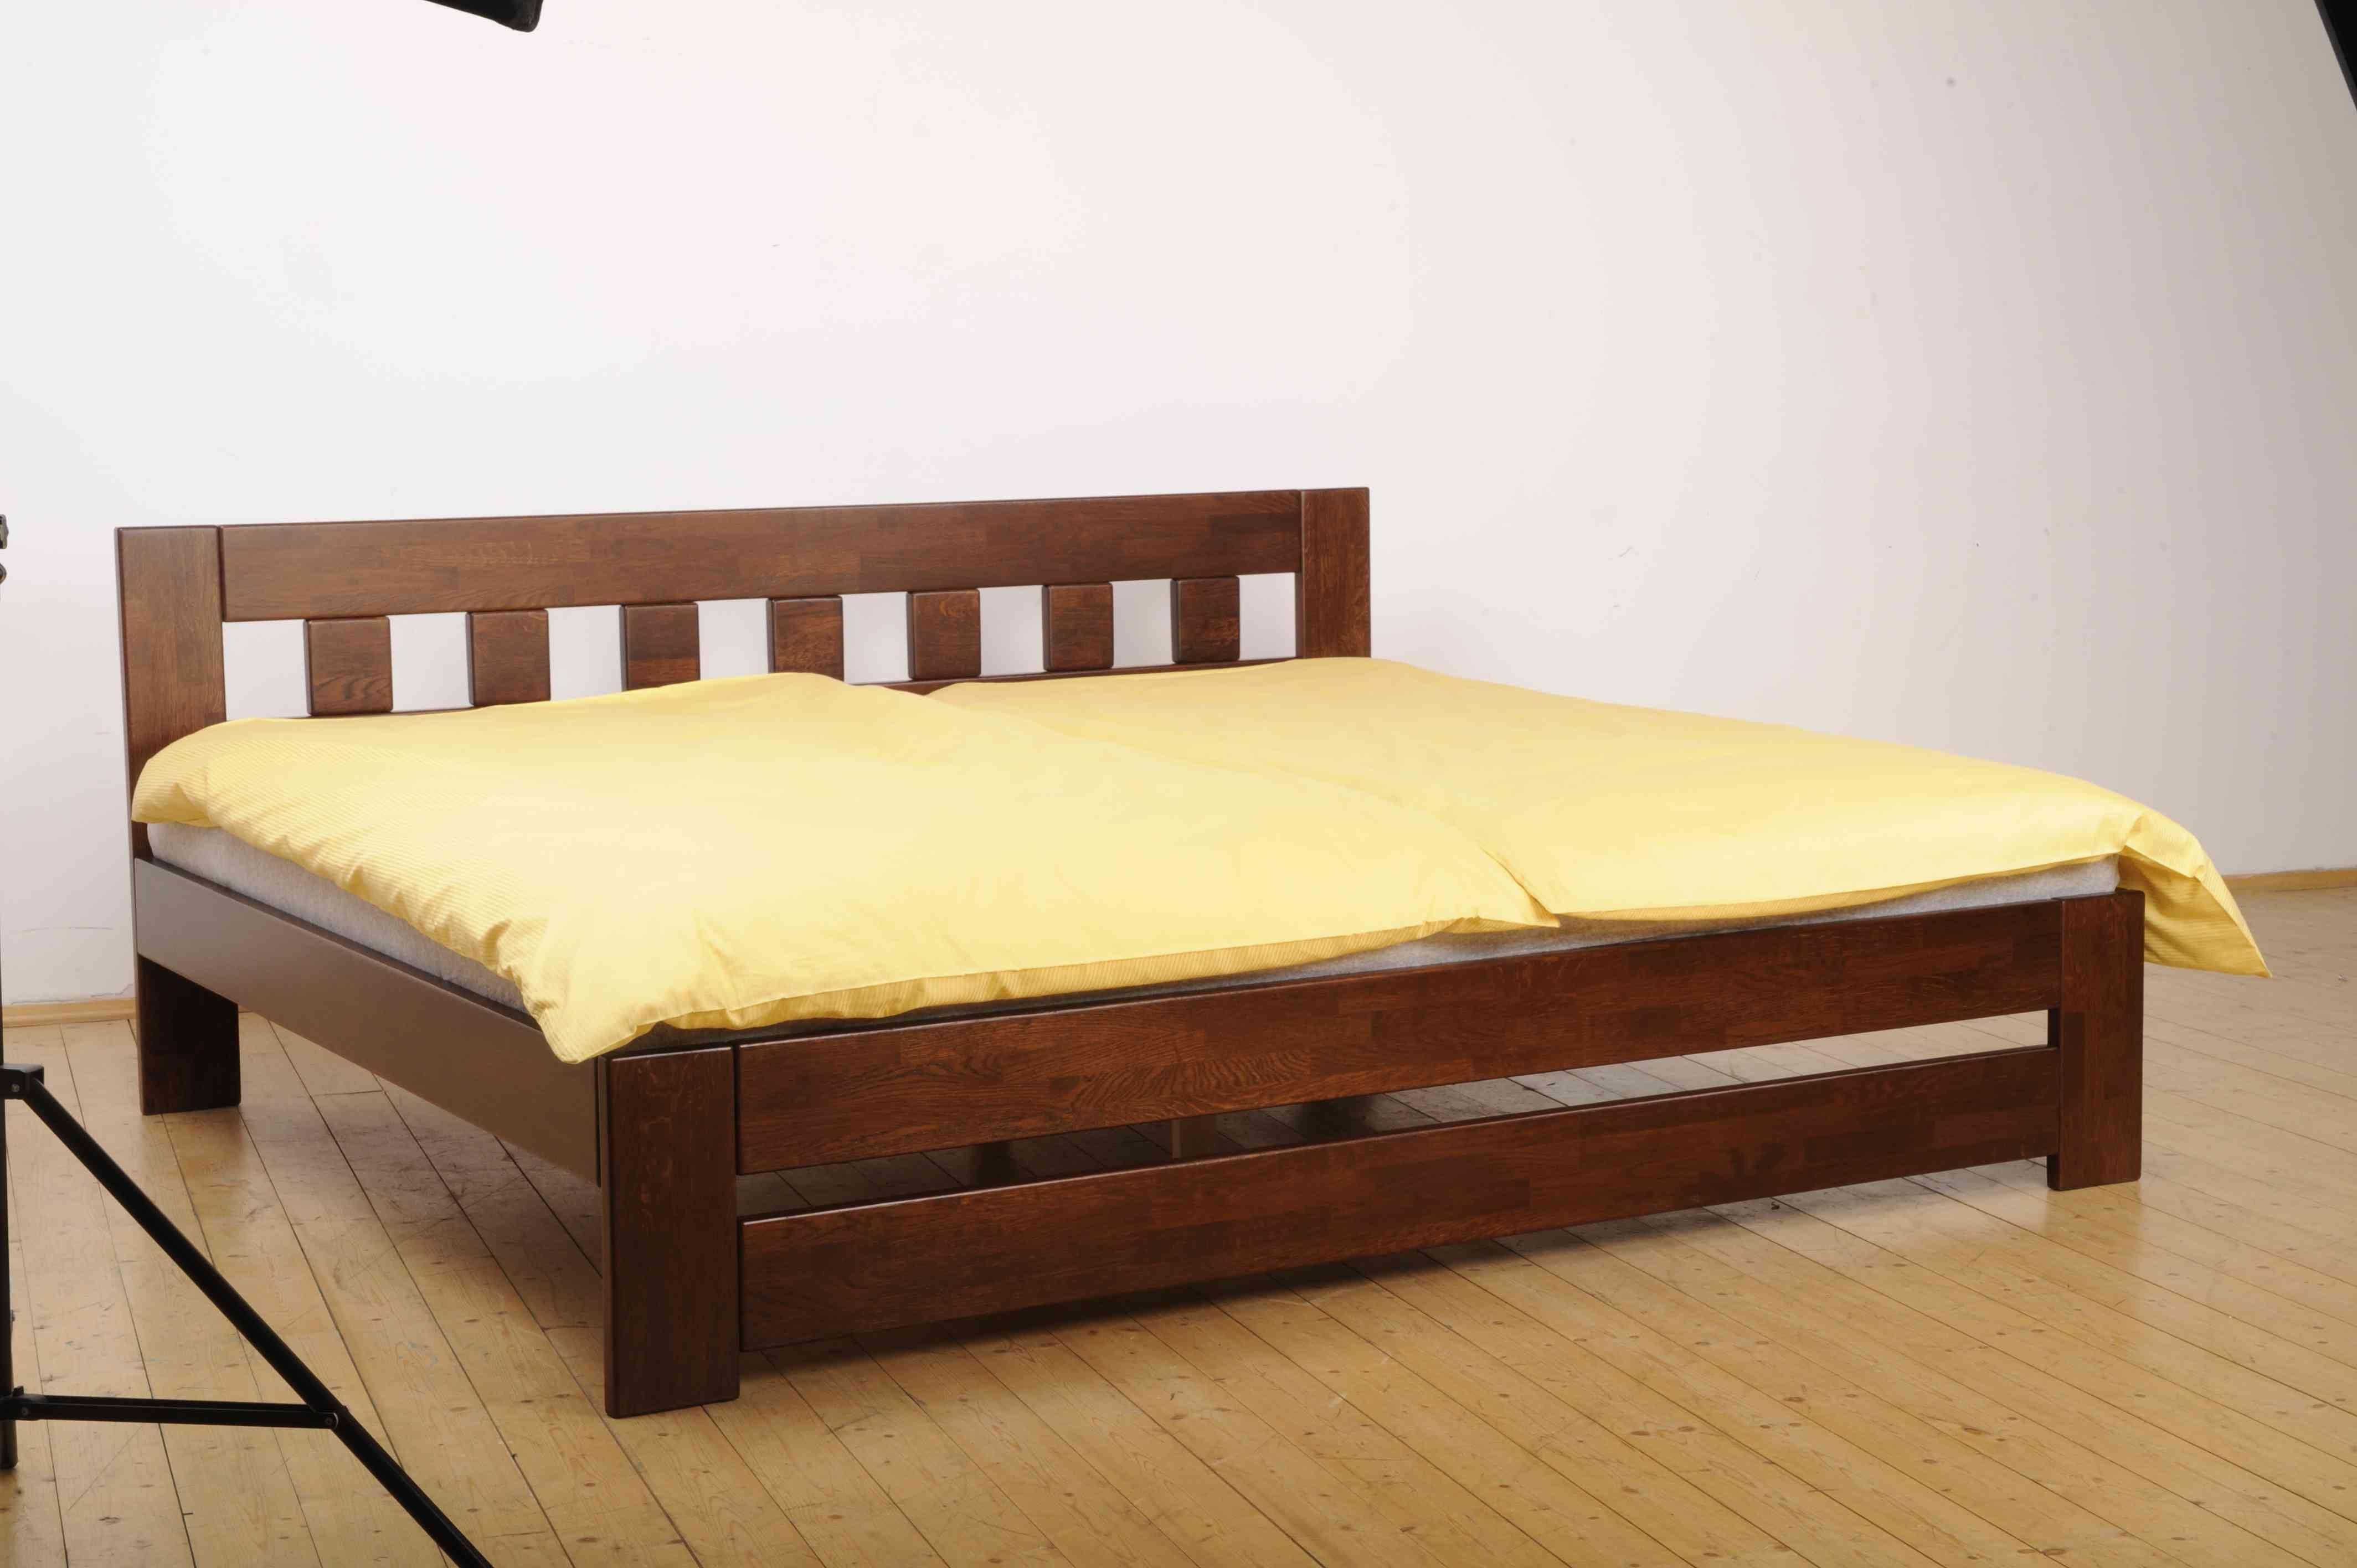 velmi široká postel